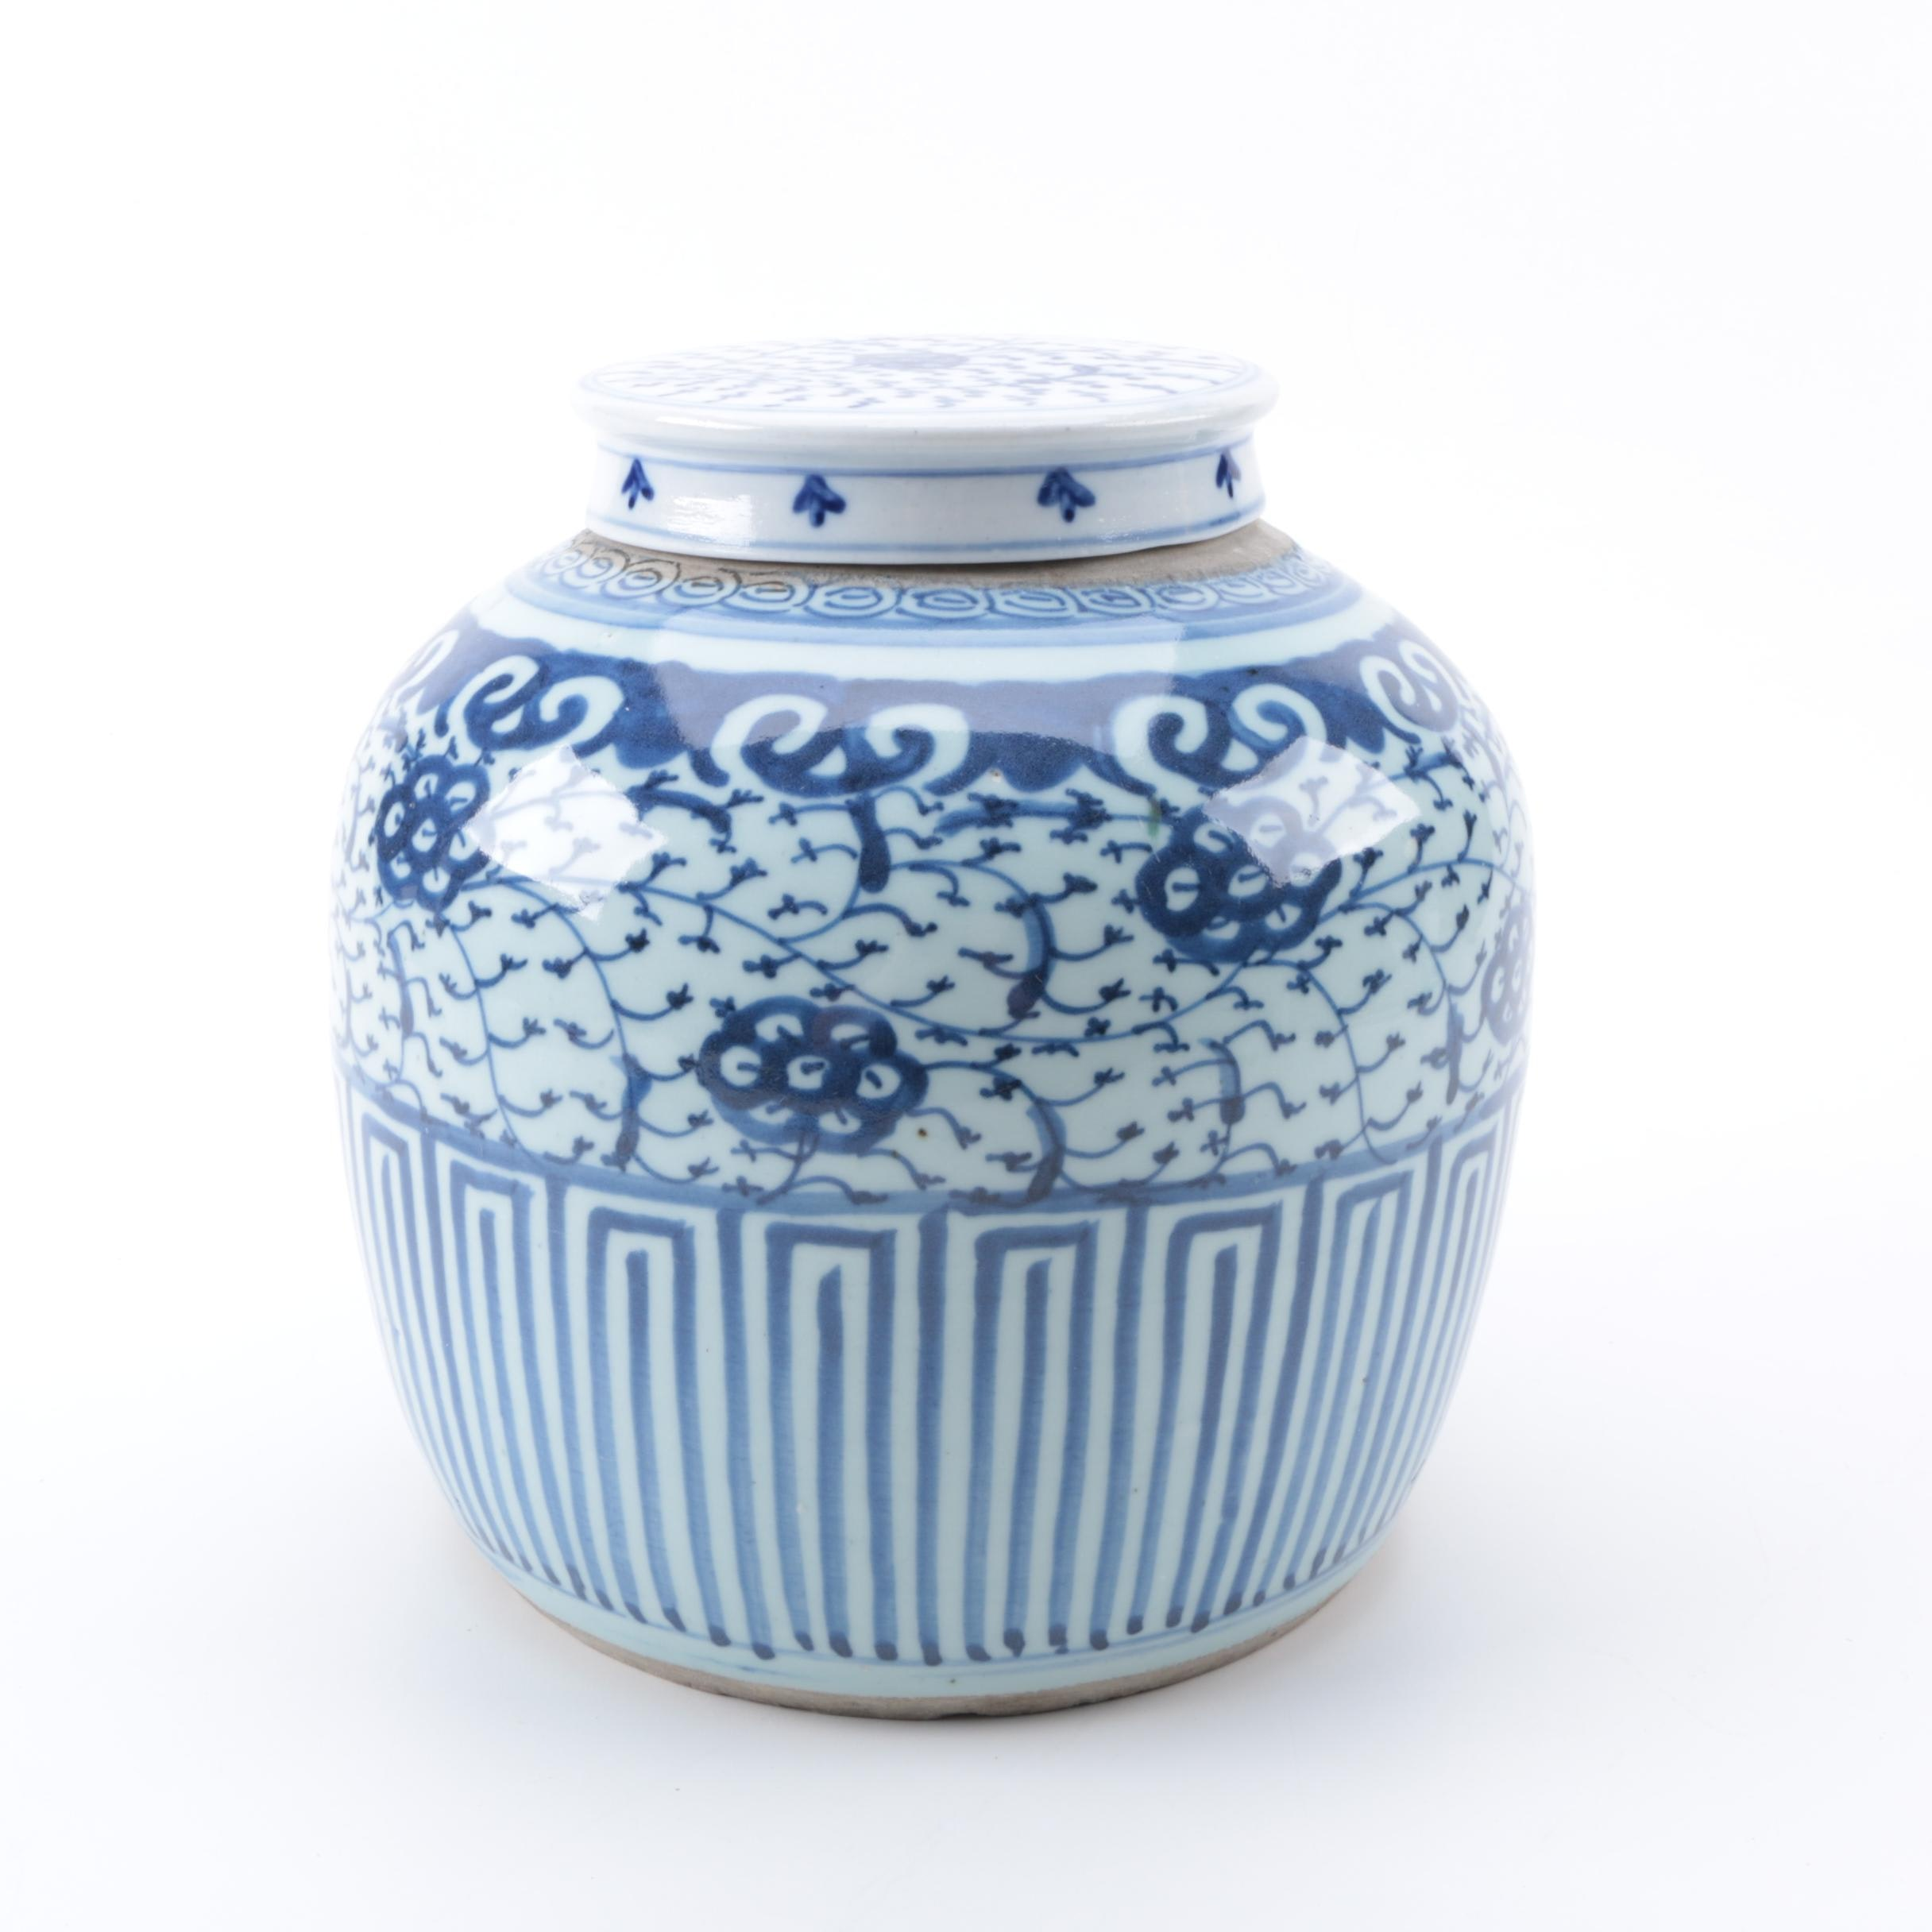 Hand-Painted Ceramic Ginger Jar